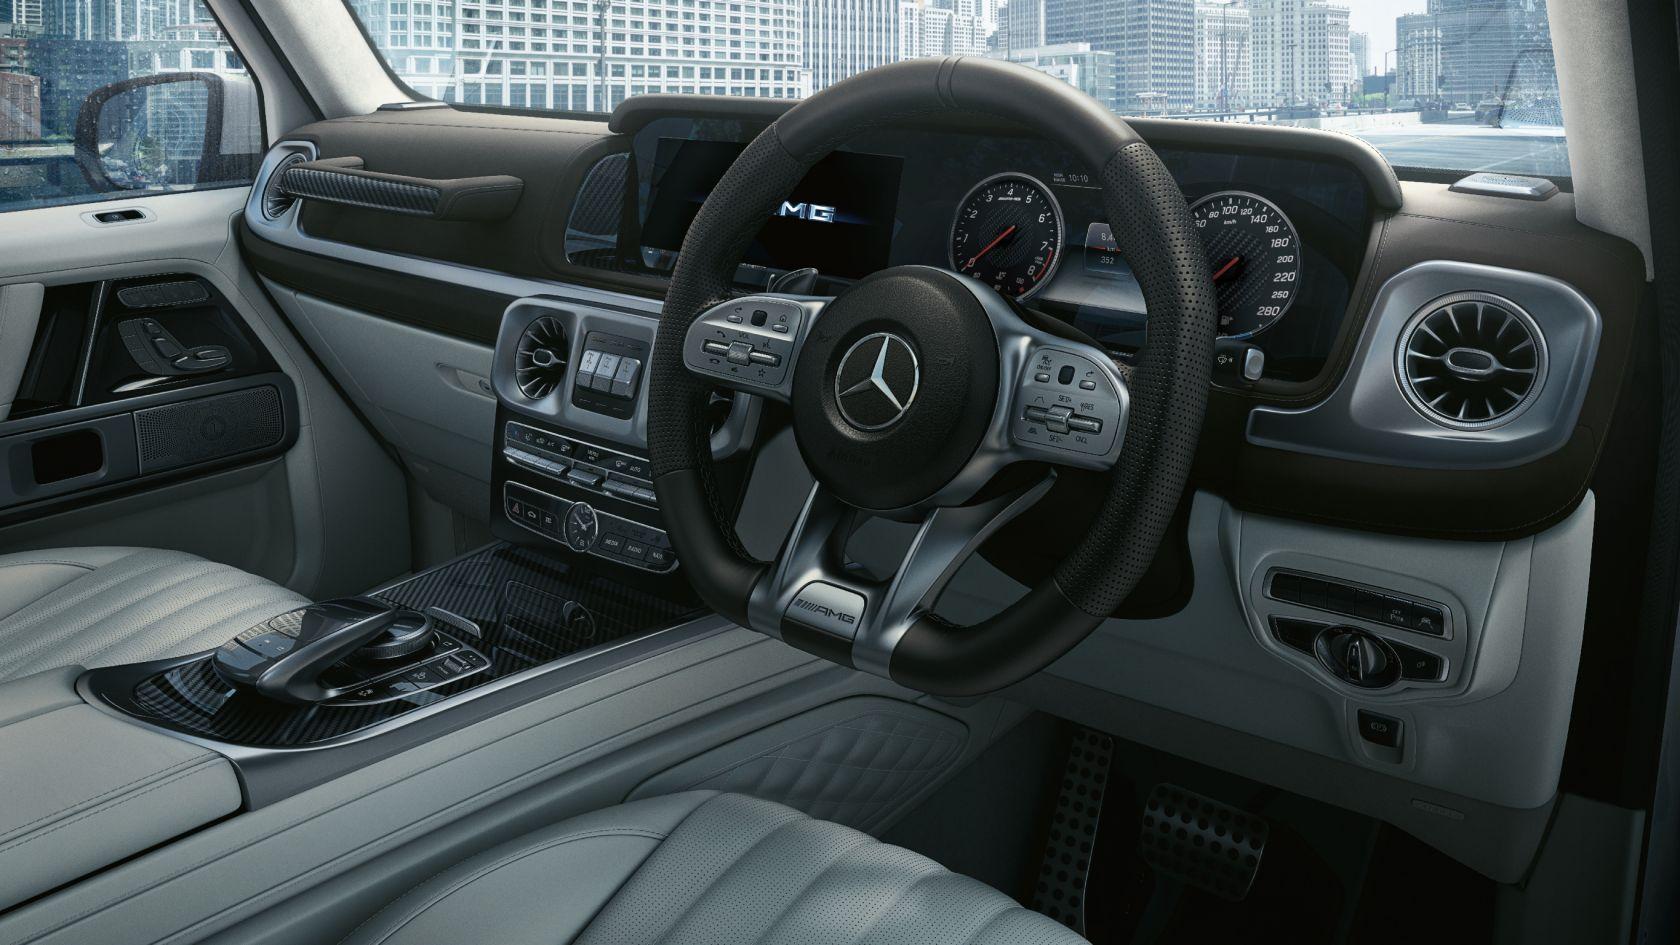 2019-Mercedes-AMG-G-63-interior